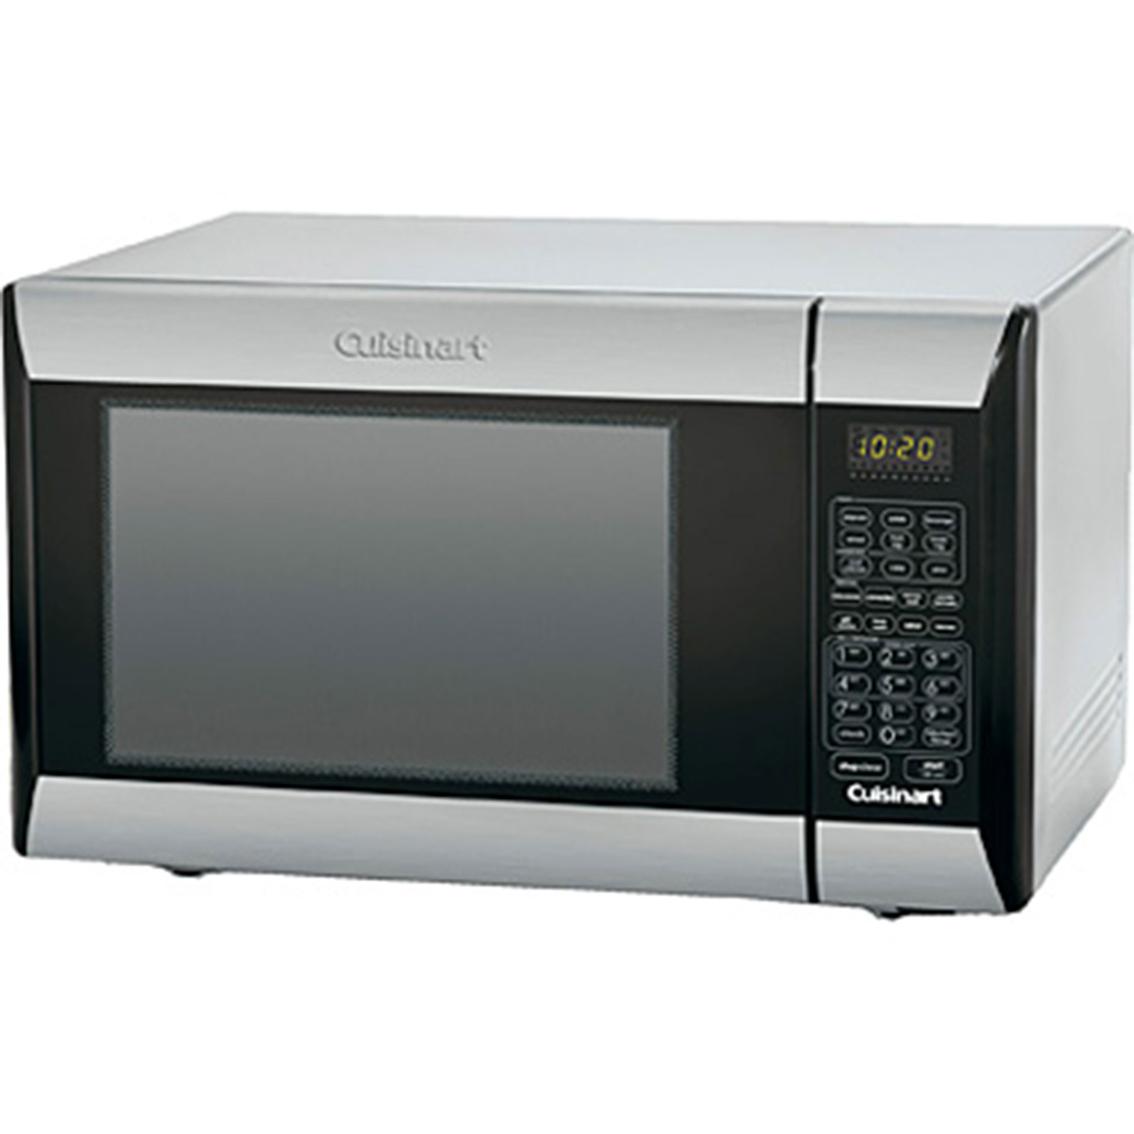 Cuisinart Microwave Convection Bestmicrowave